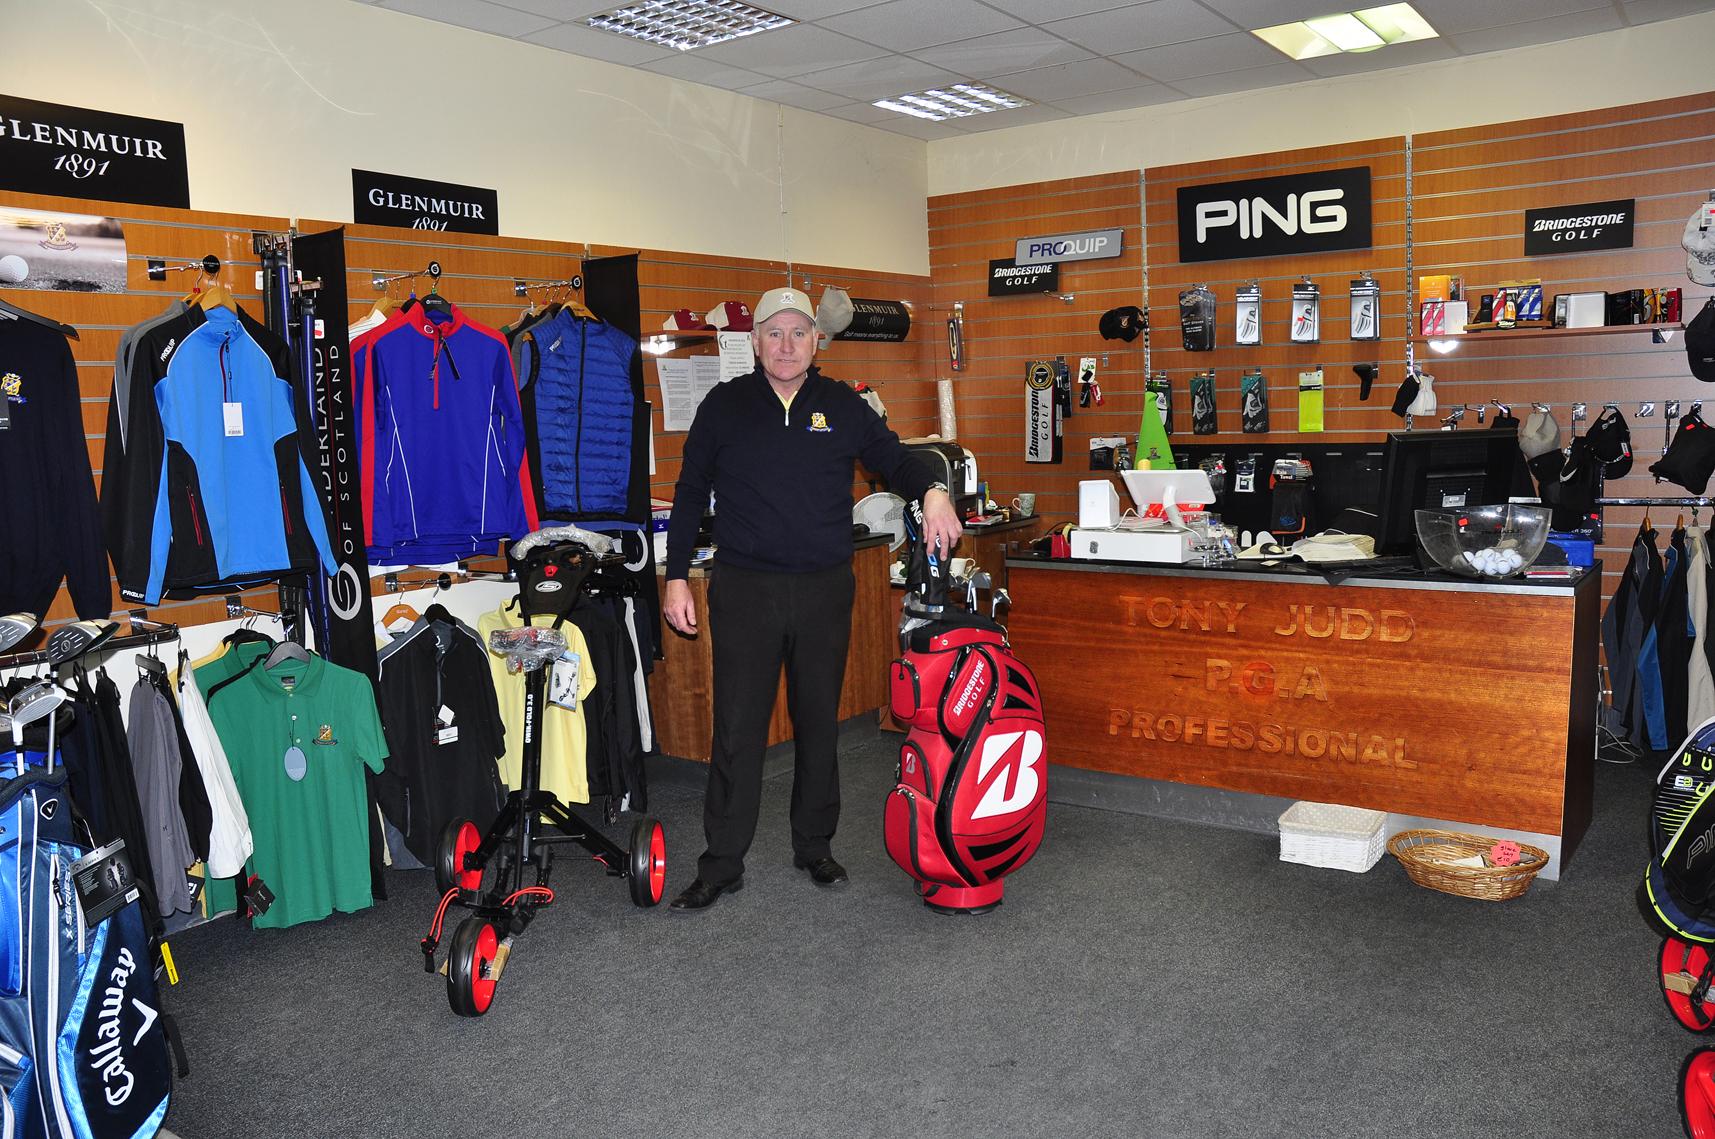 Tony Judd PGA Professional